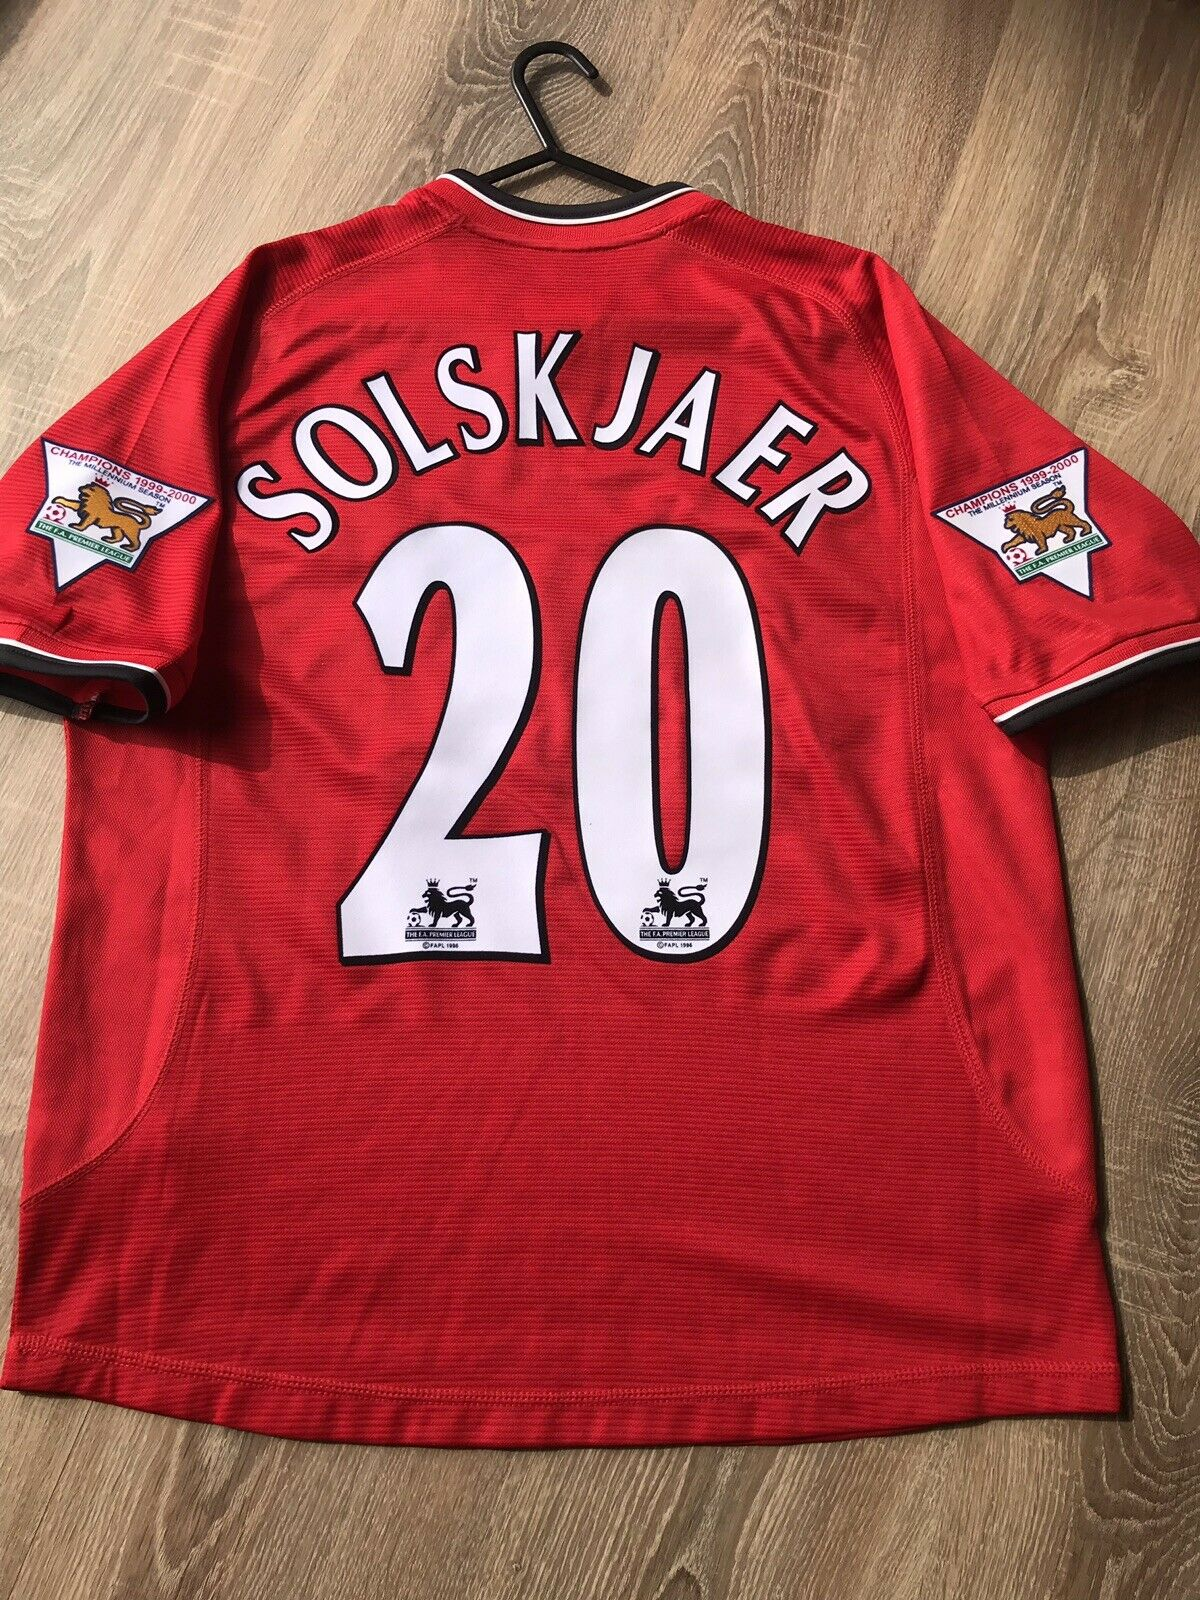 Manchester United Vintage 200002 maglietta adulti S 20 Solskjaer